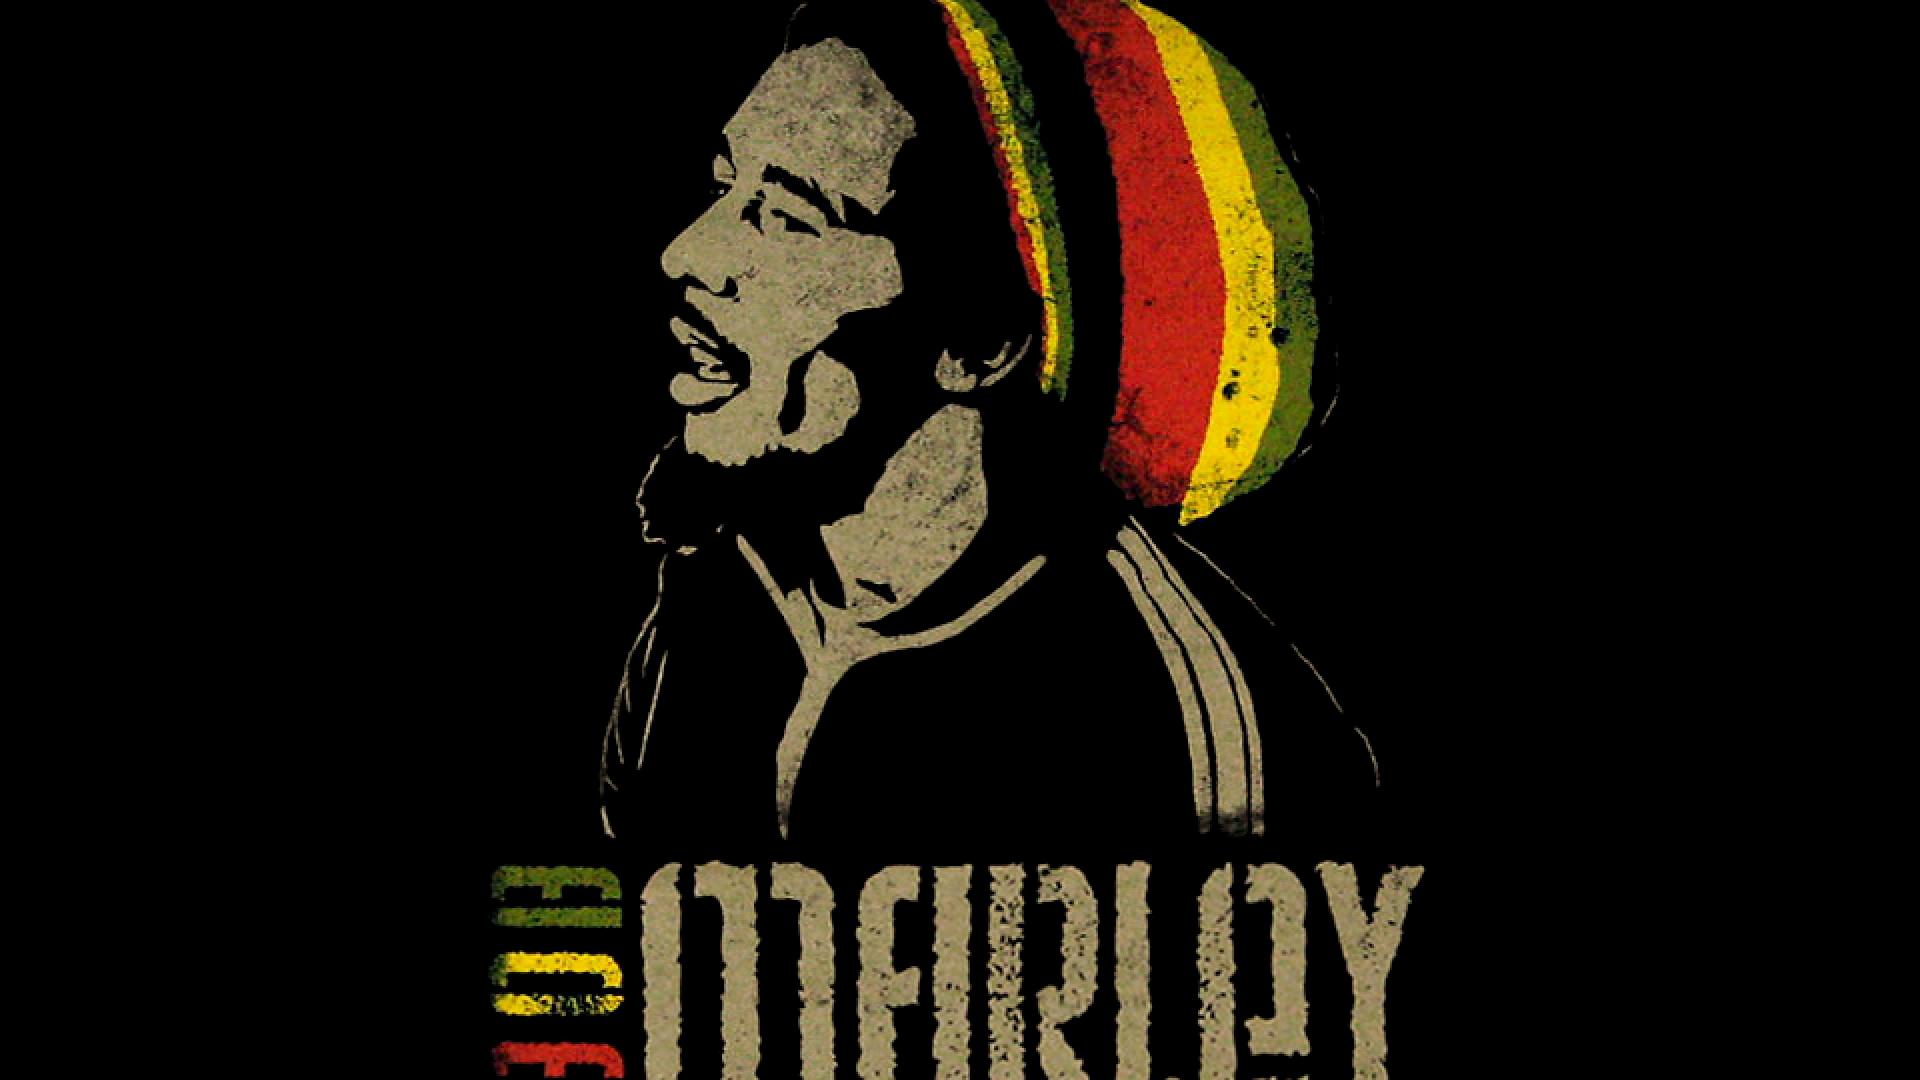 bob marley hd wallpapers